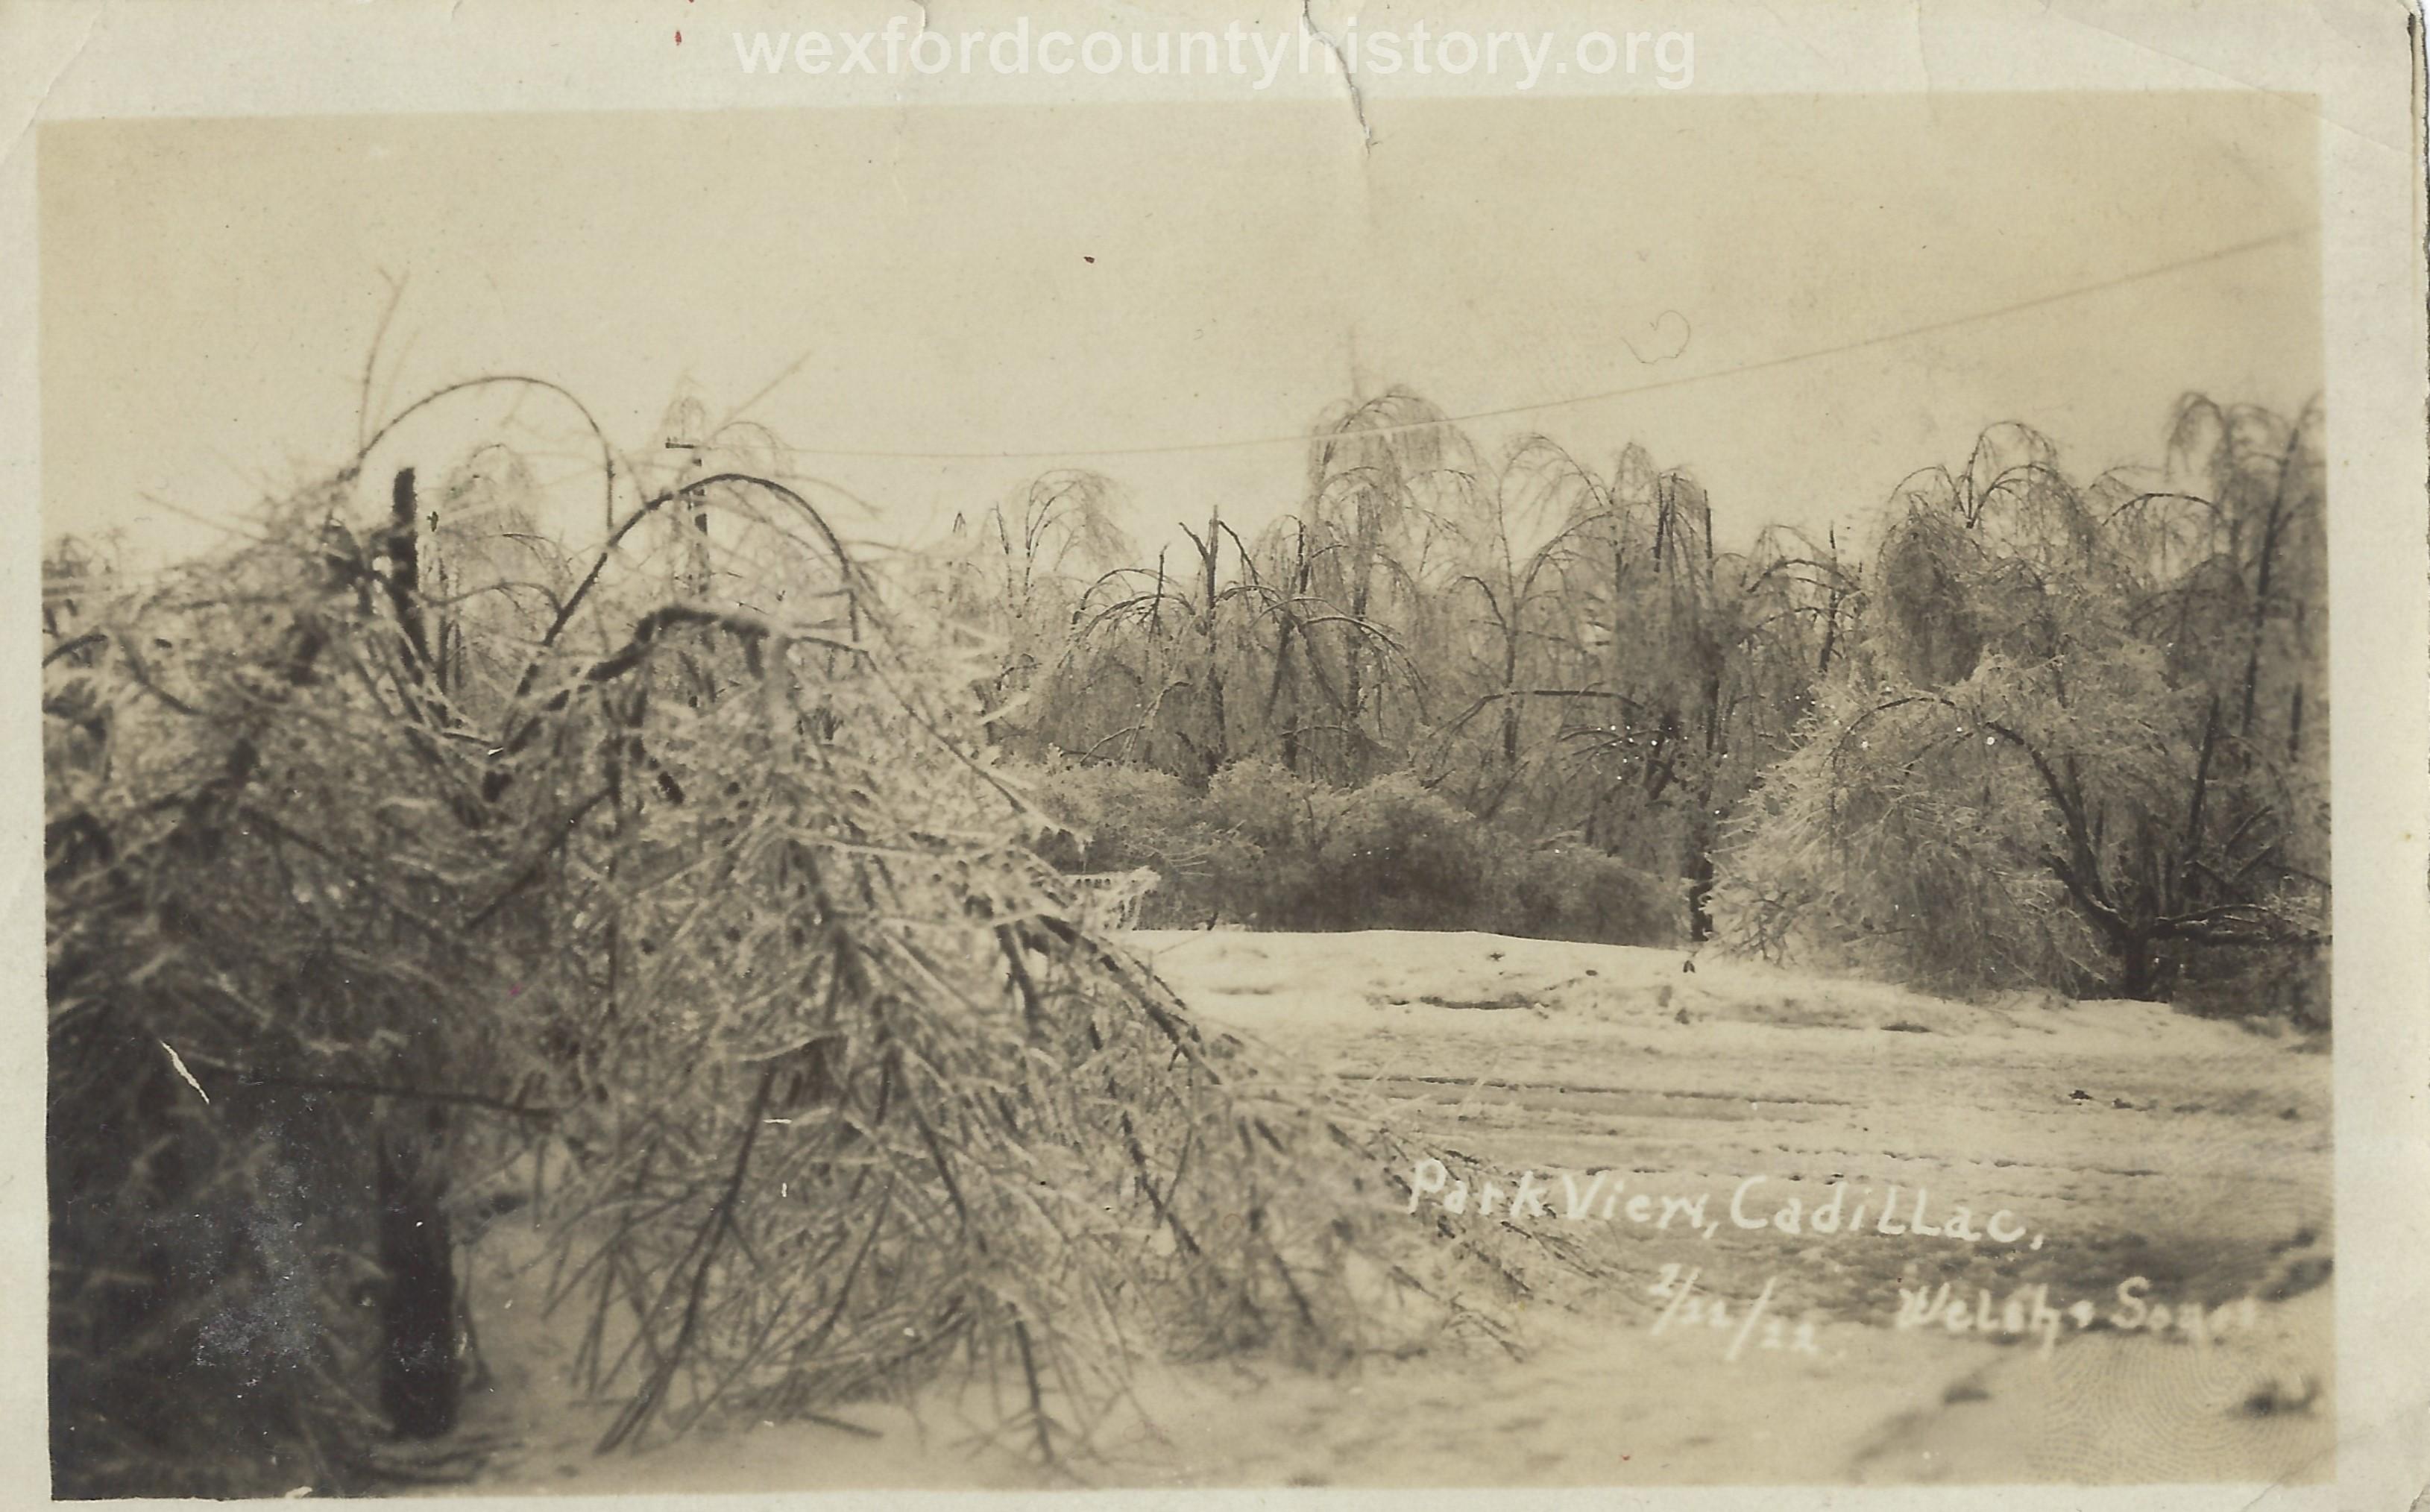 1922 Ice Storm - City Park